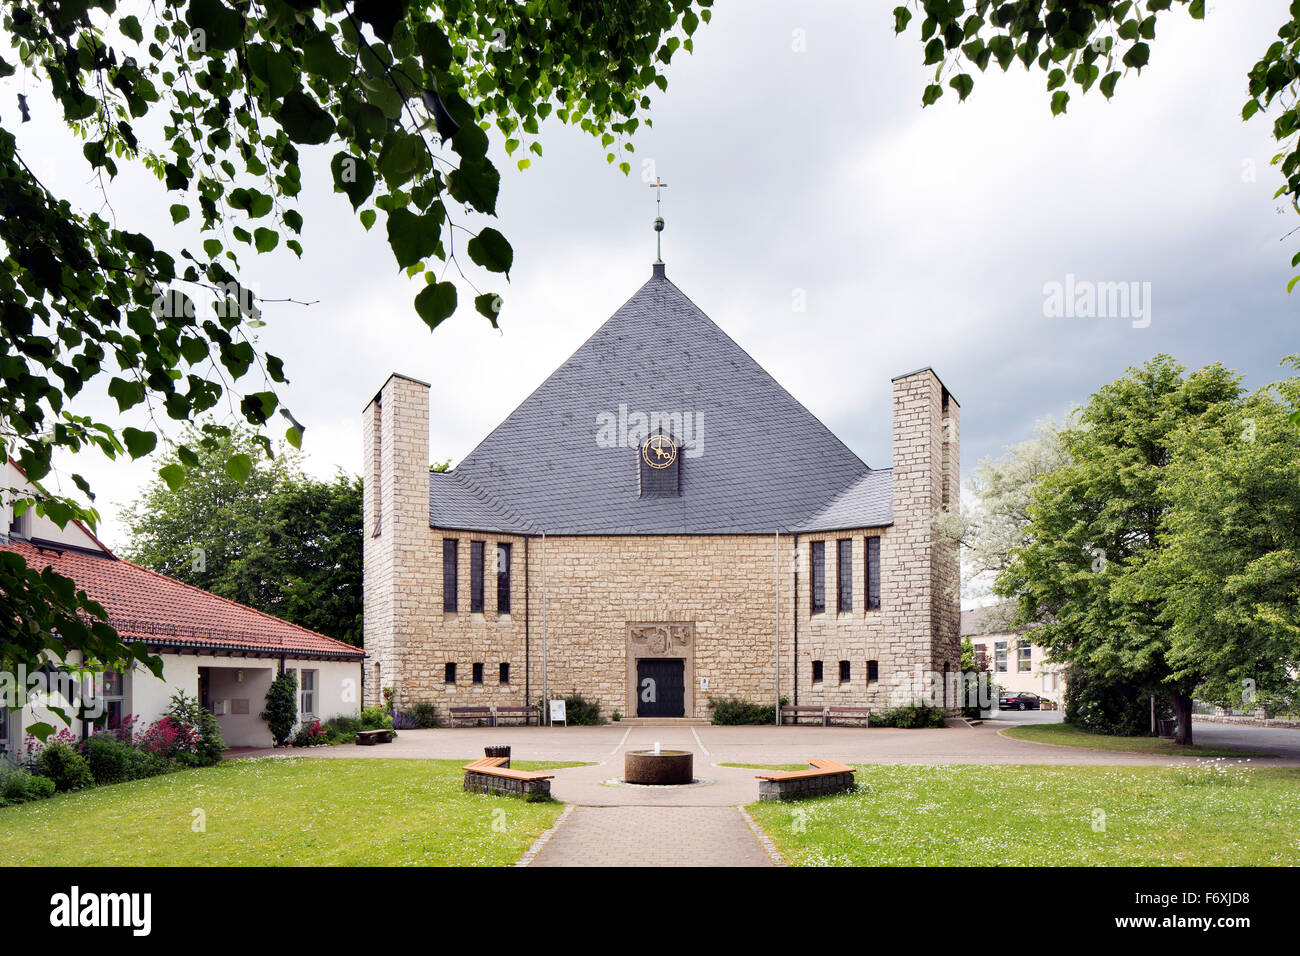 Evangelical Lutheran Trinity Church, Bad Staffelstein, Upper Franconia, Bavaria, Germany - Stock Image